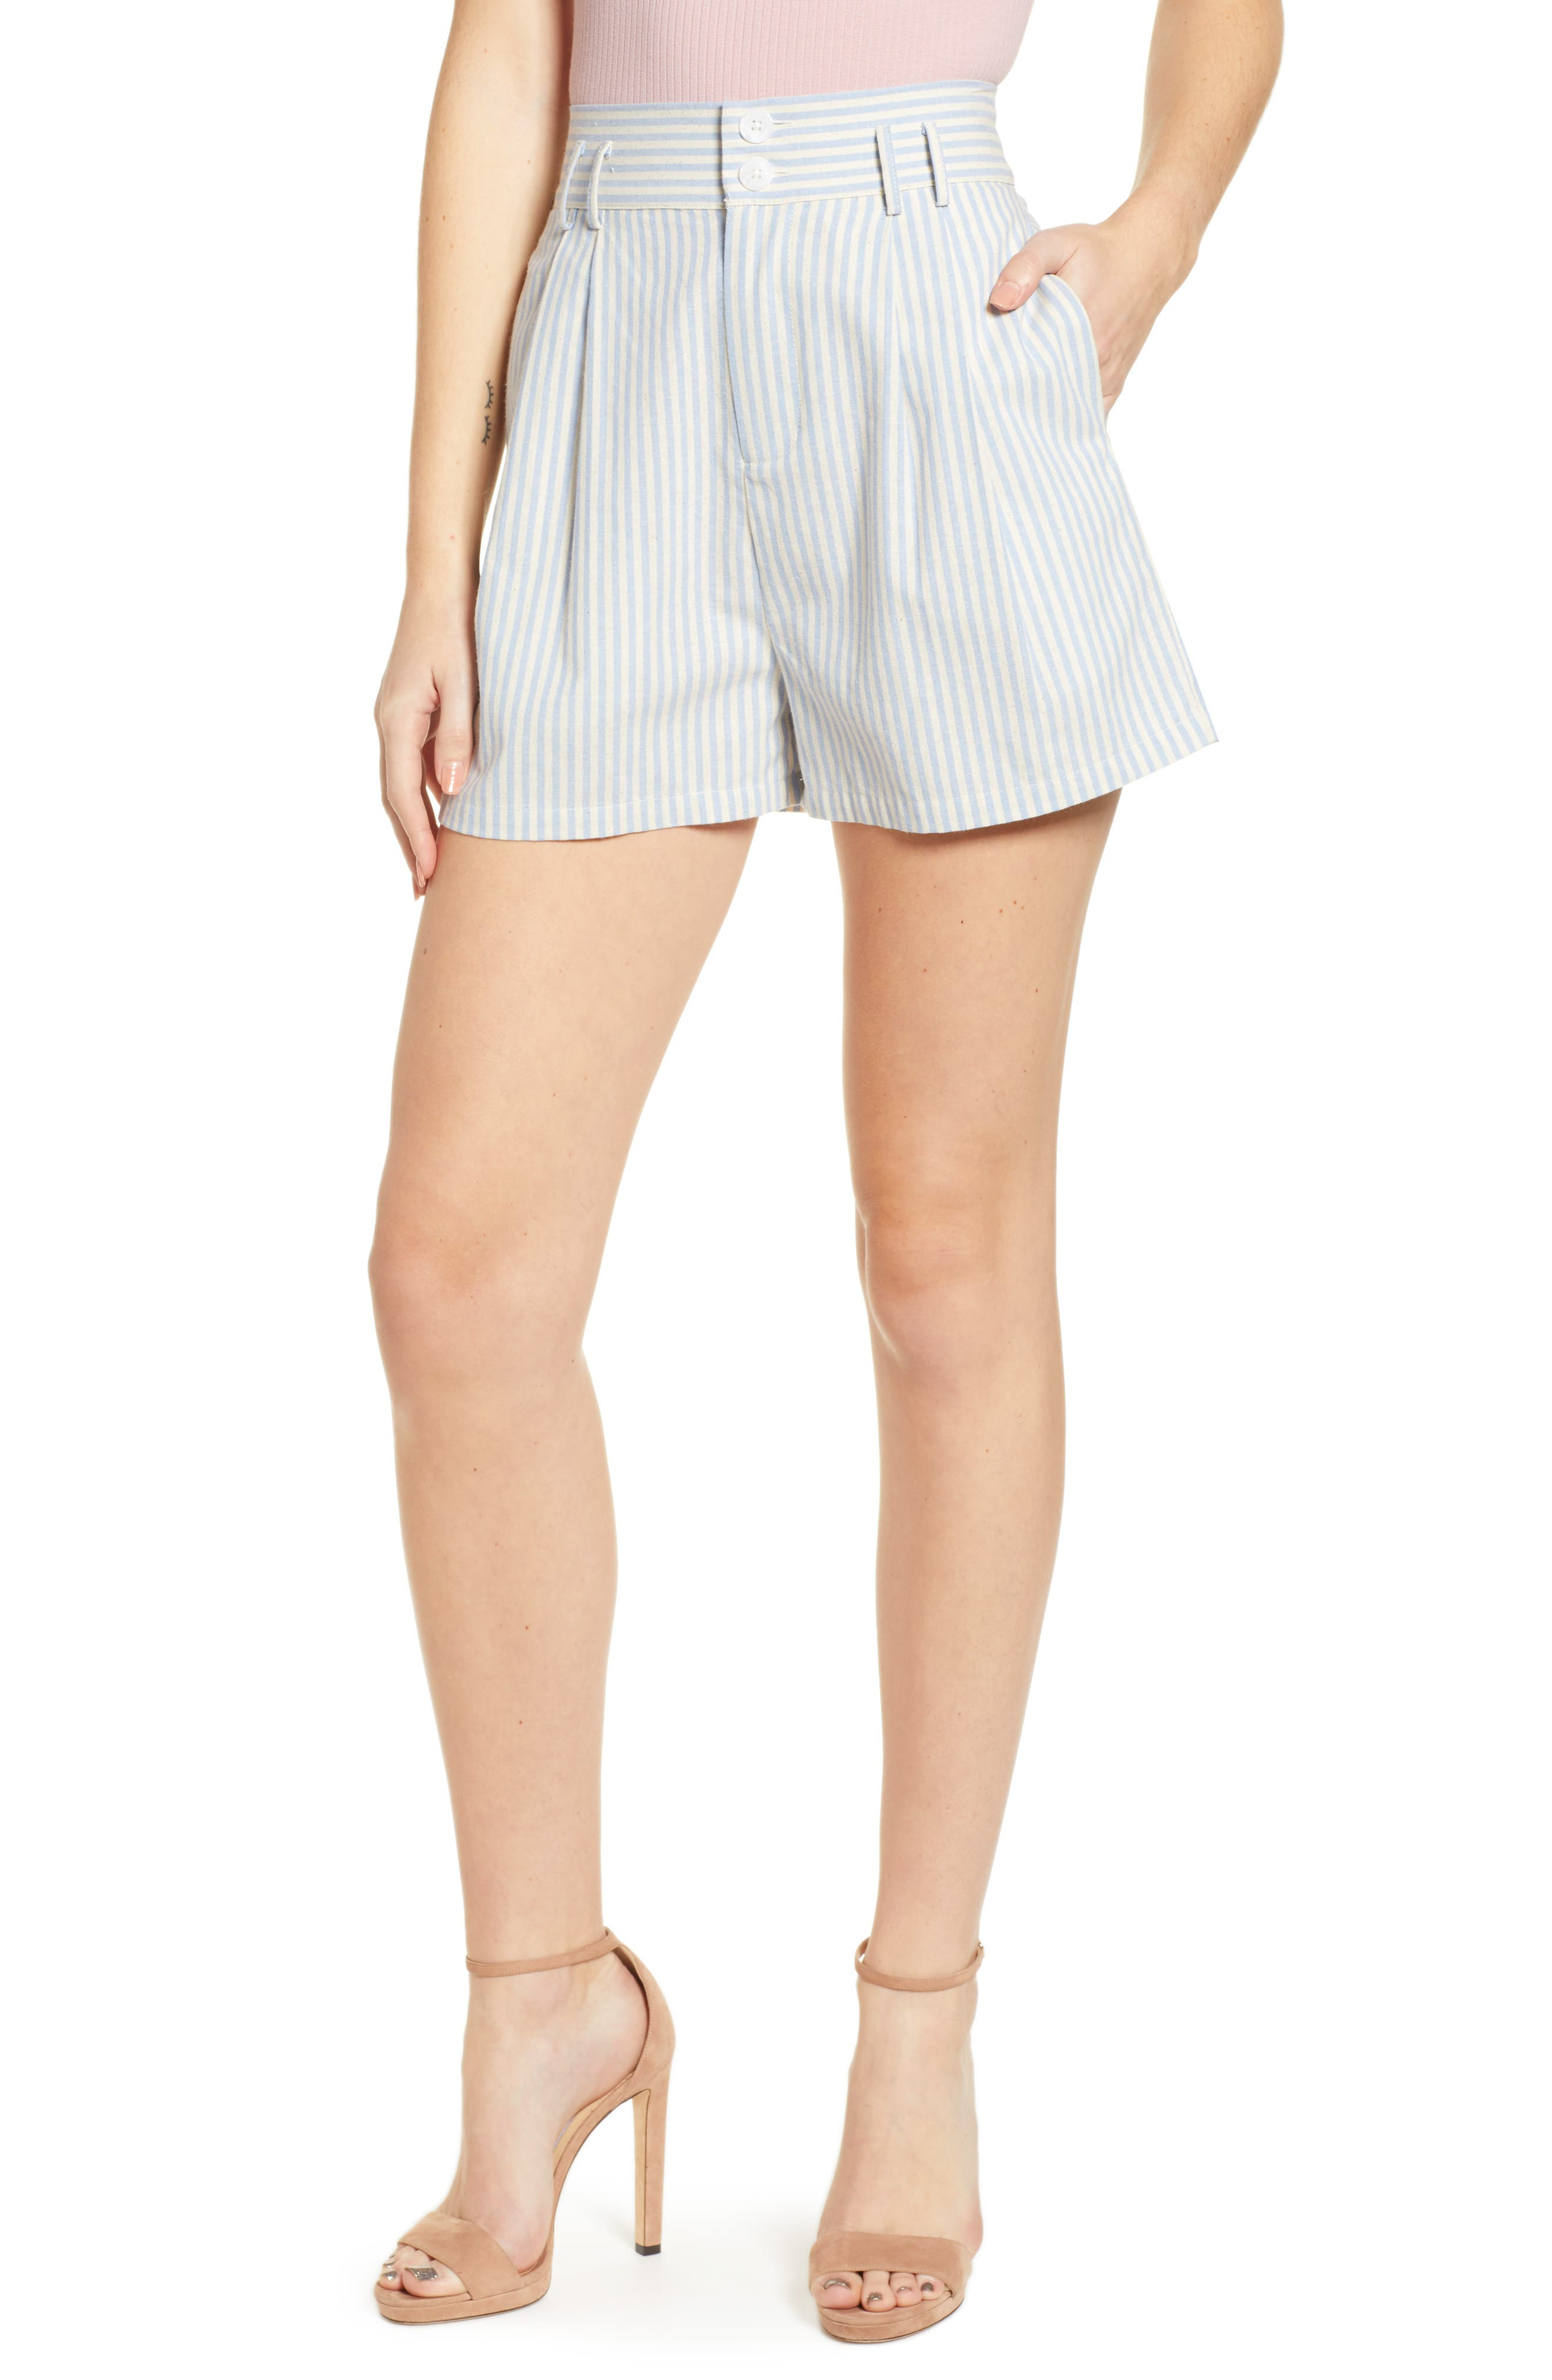 1930s Clothing Womens English Factory Striped Bermuda Shorts $58.00 AT vintagedancer.com